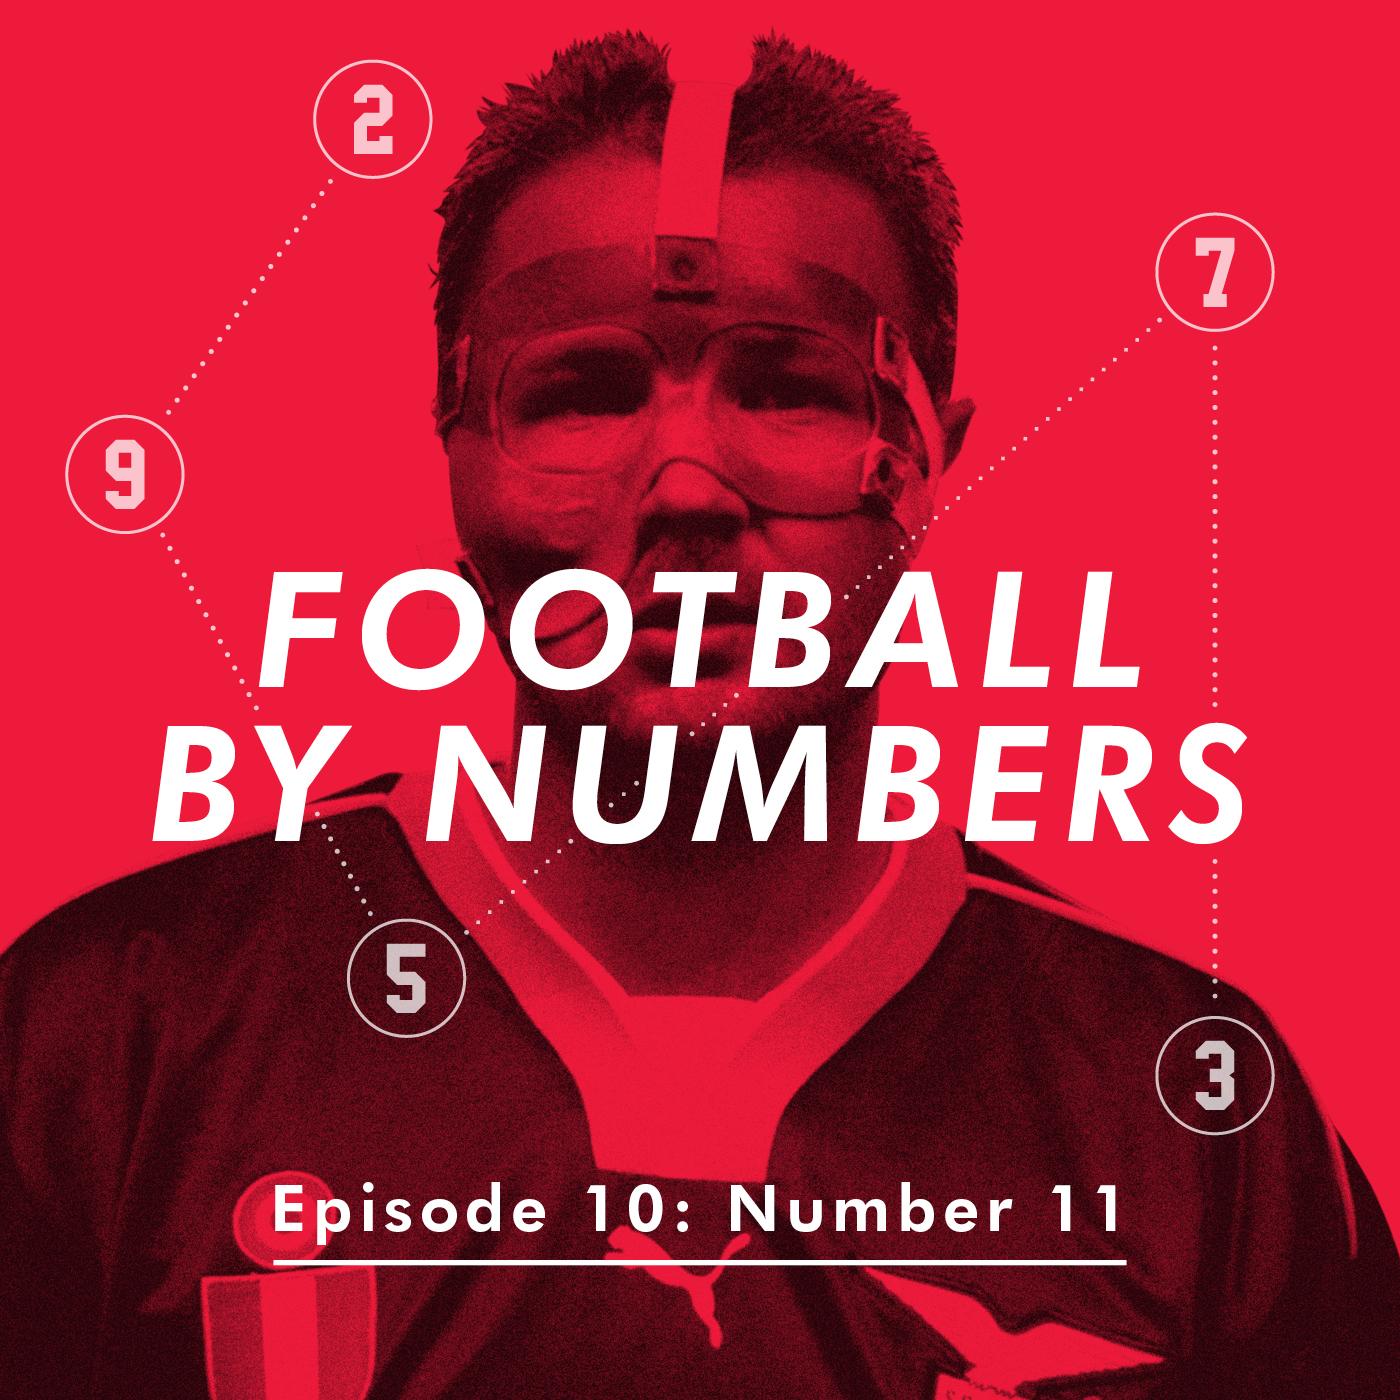 FootballByNumbers-Covers-E10.jpg